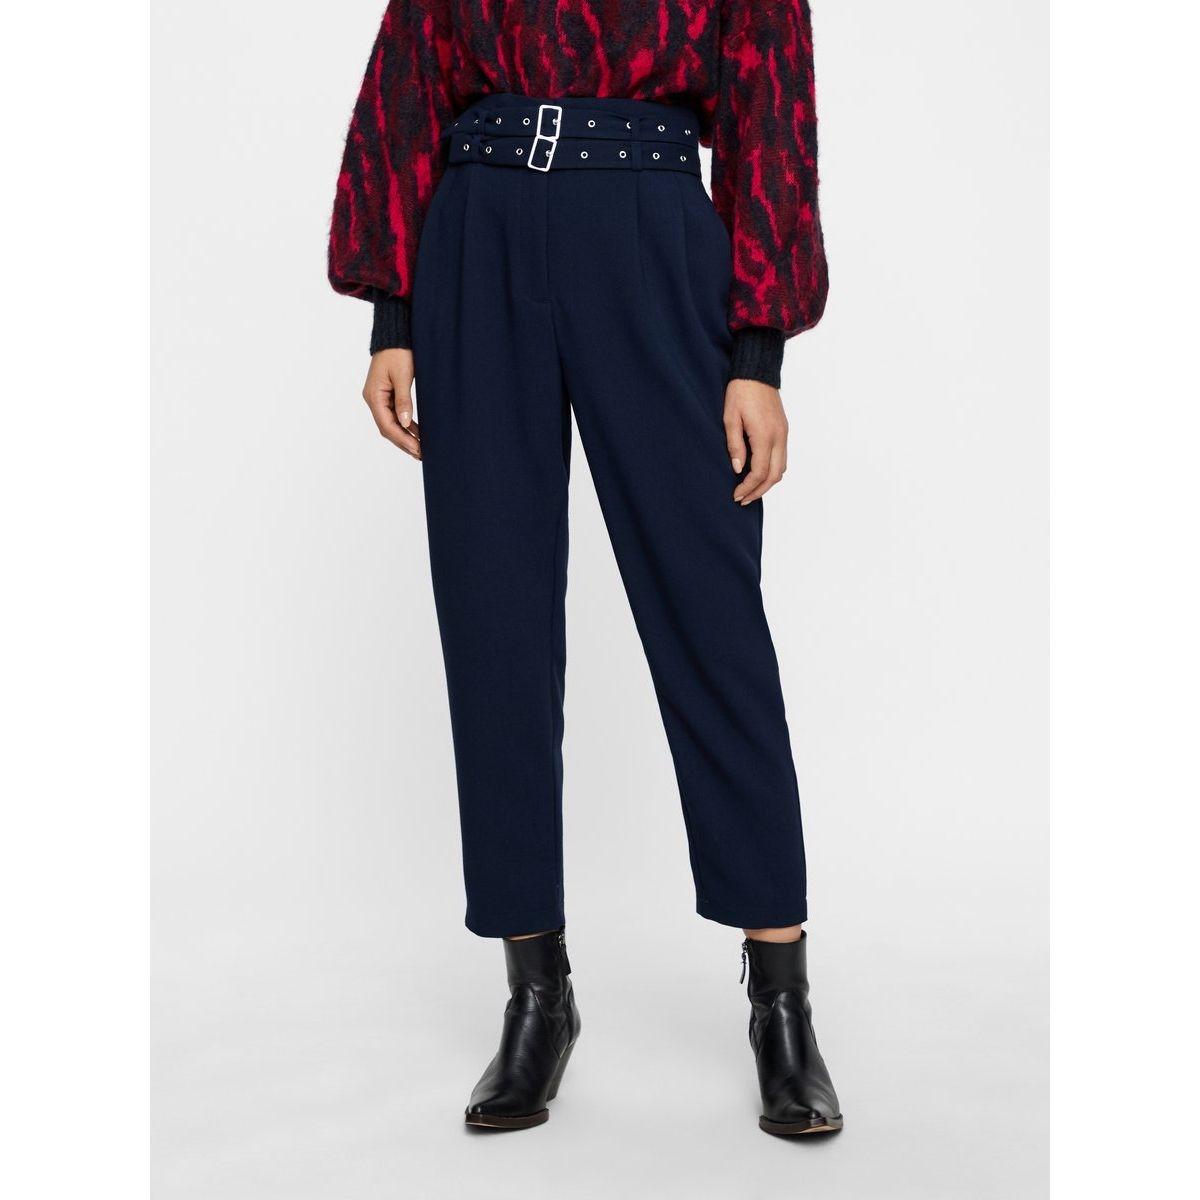 Pantalon Double ceinture